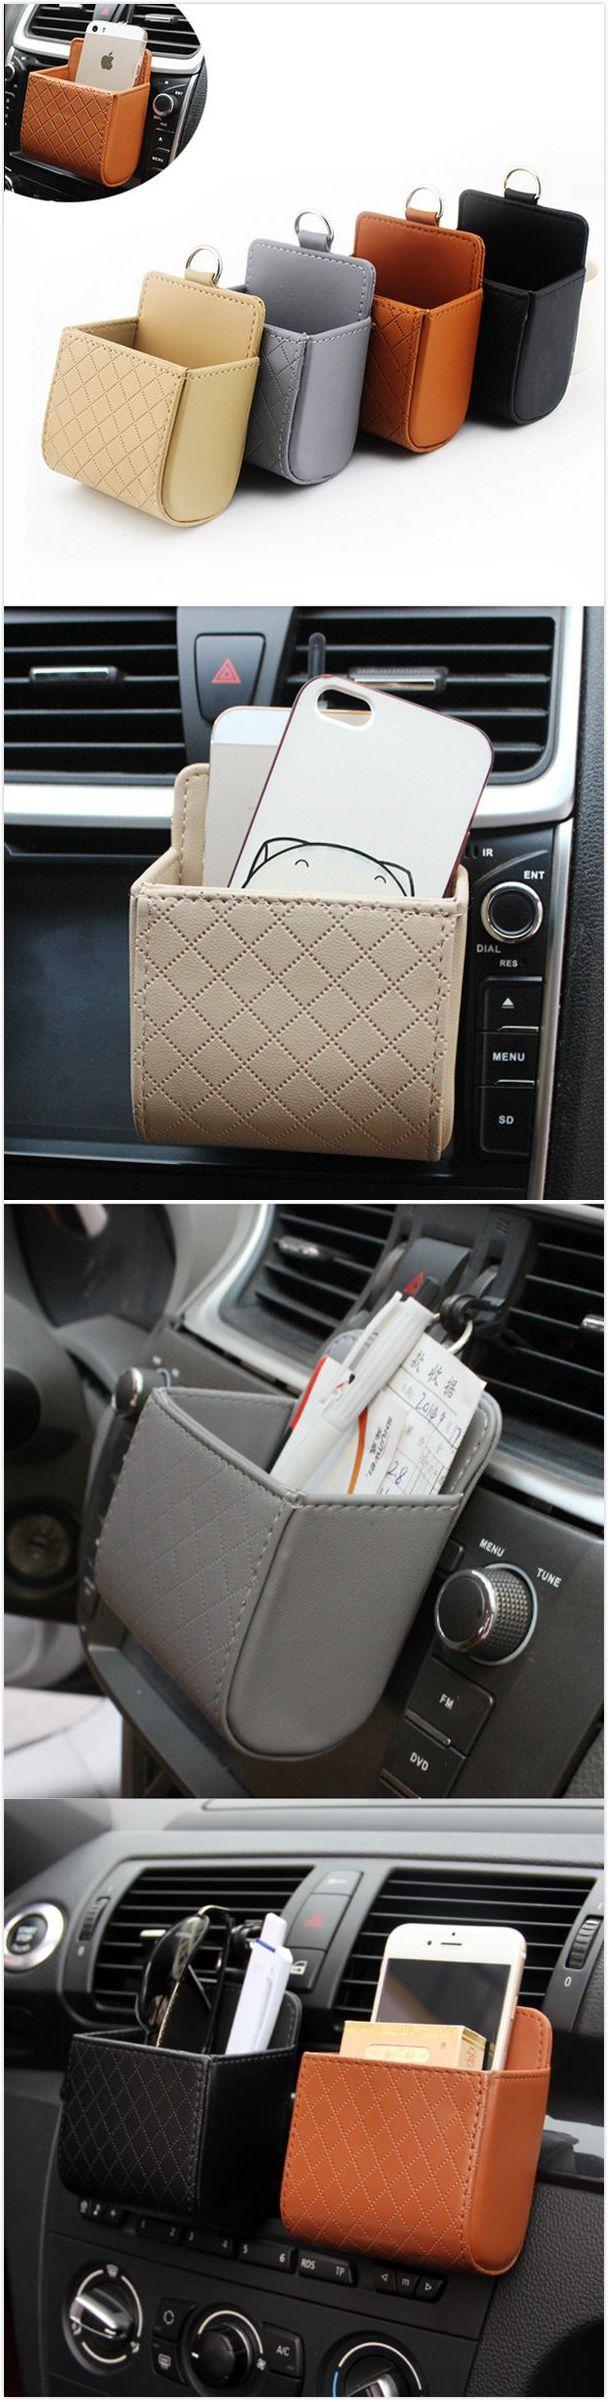 Auto Air Vent Car Storage Bag Multi Functional Pu Phone Bag Ditty Bag Special 3 Us 16 98 Car Storage Bag Bag Storage Car Accessories